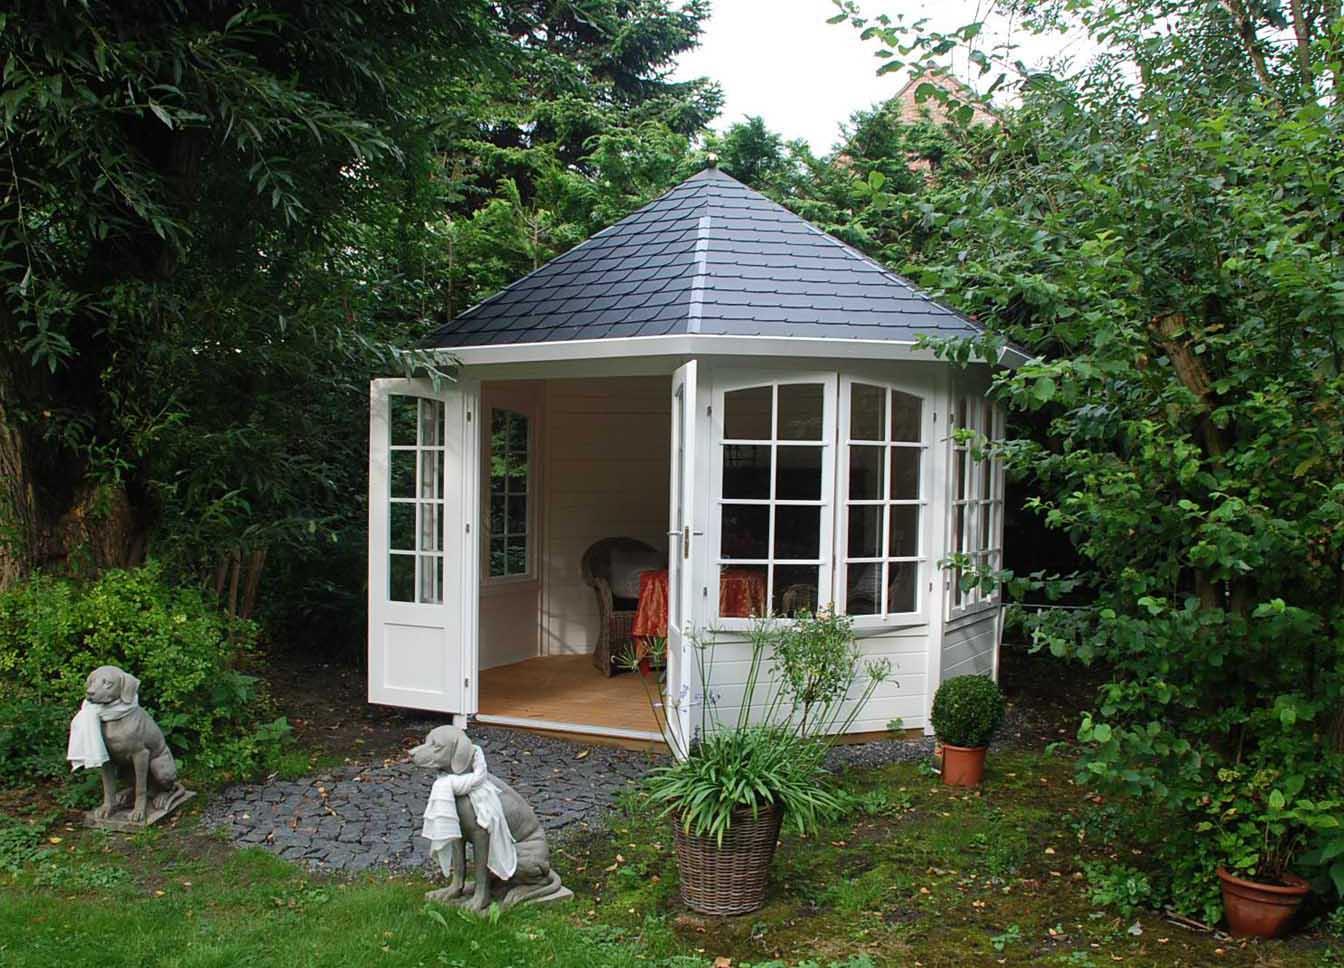 gartenpavillon modell emma 40 mit vier fenstern 122421 a z gartenhaus gmbh. Black Bedroom Furniture Sets. Home Design Ideas